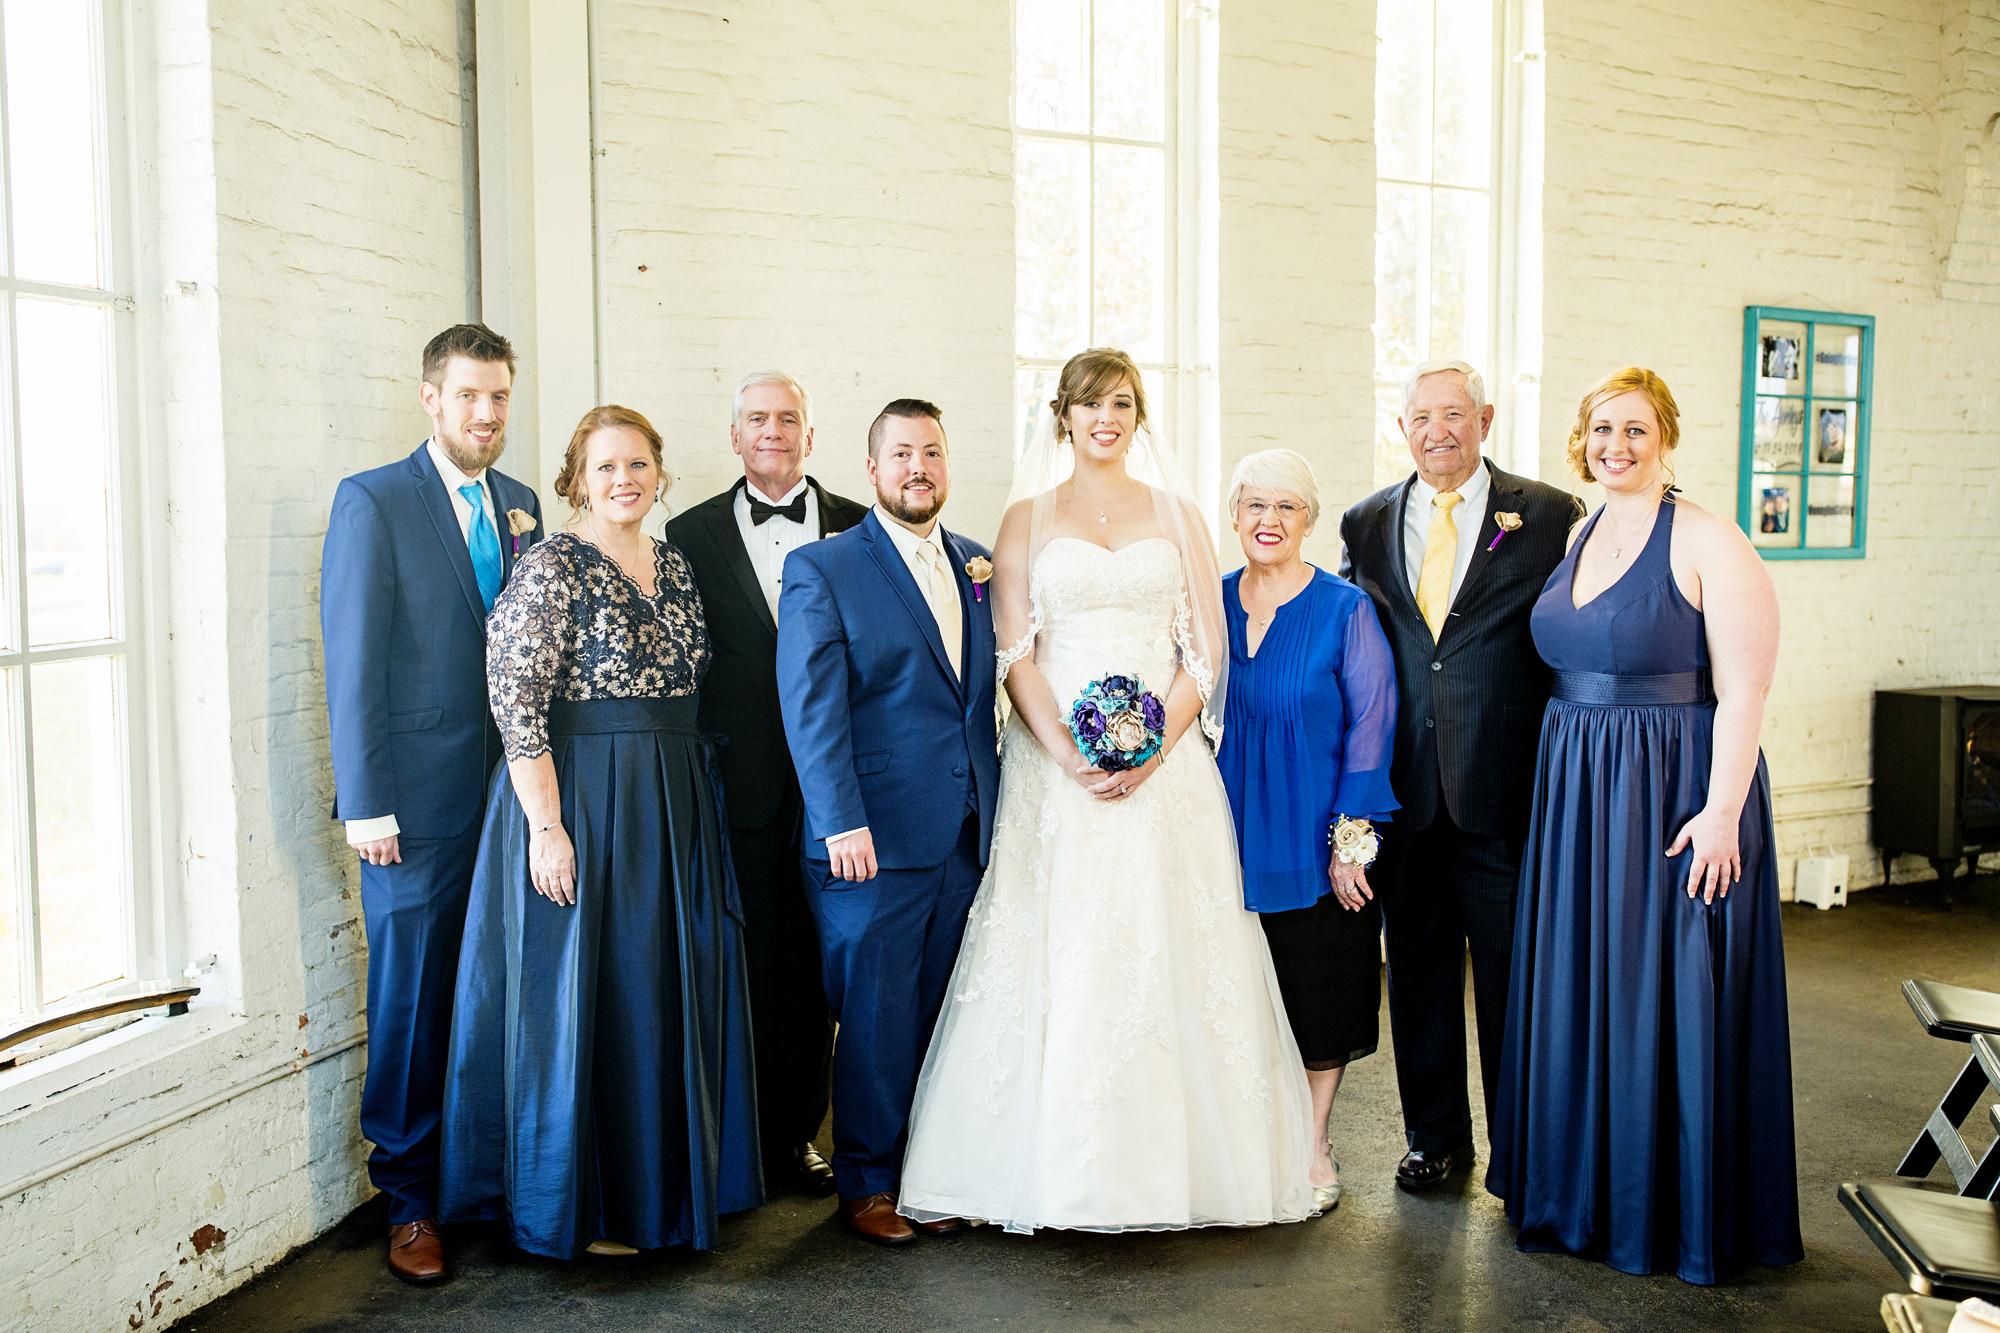 Seriously_Sabrina_Photography_Lexington_Kentucky_21c_Round_Barn_Red_Mile_Wedding_Gorley_44.jpg